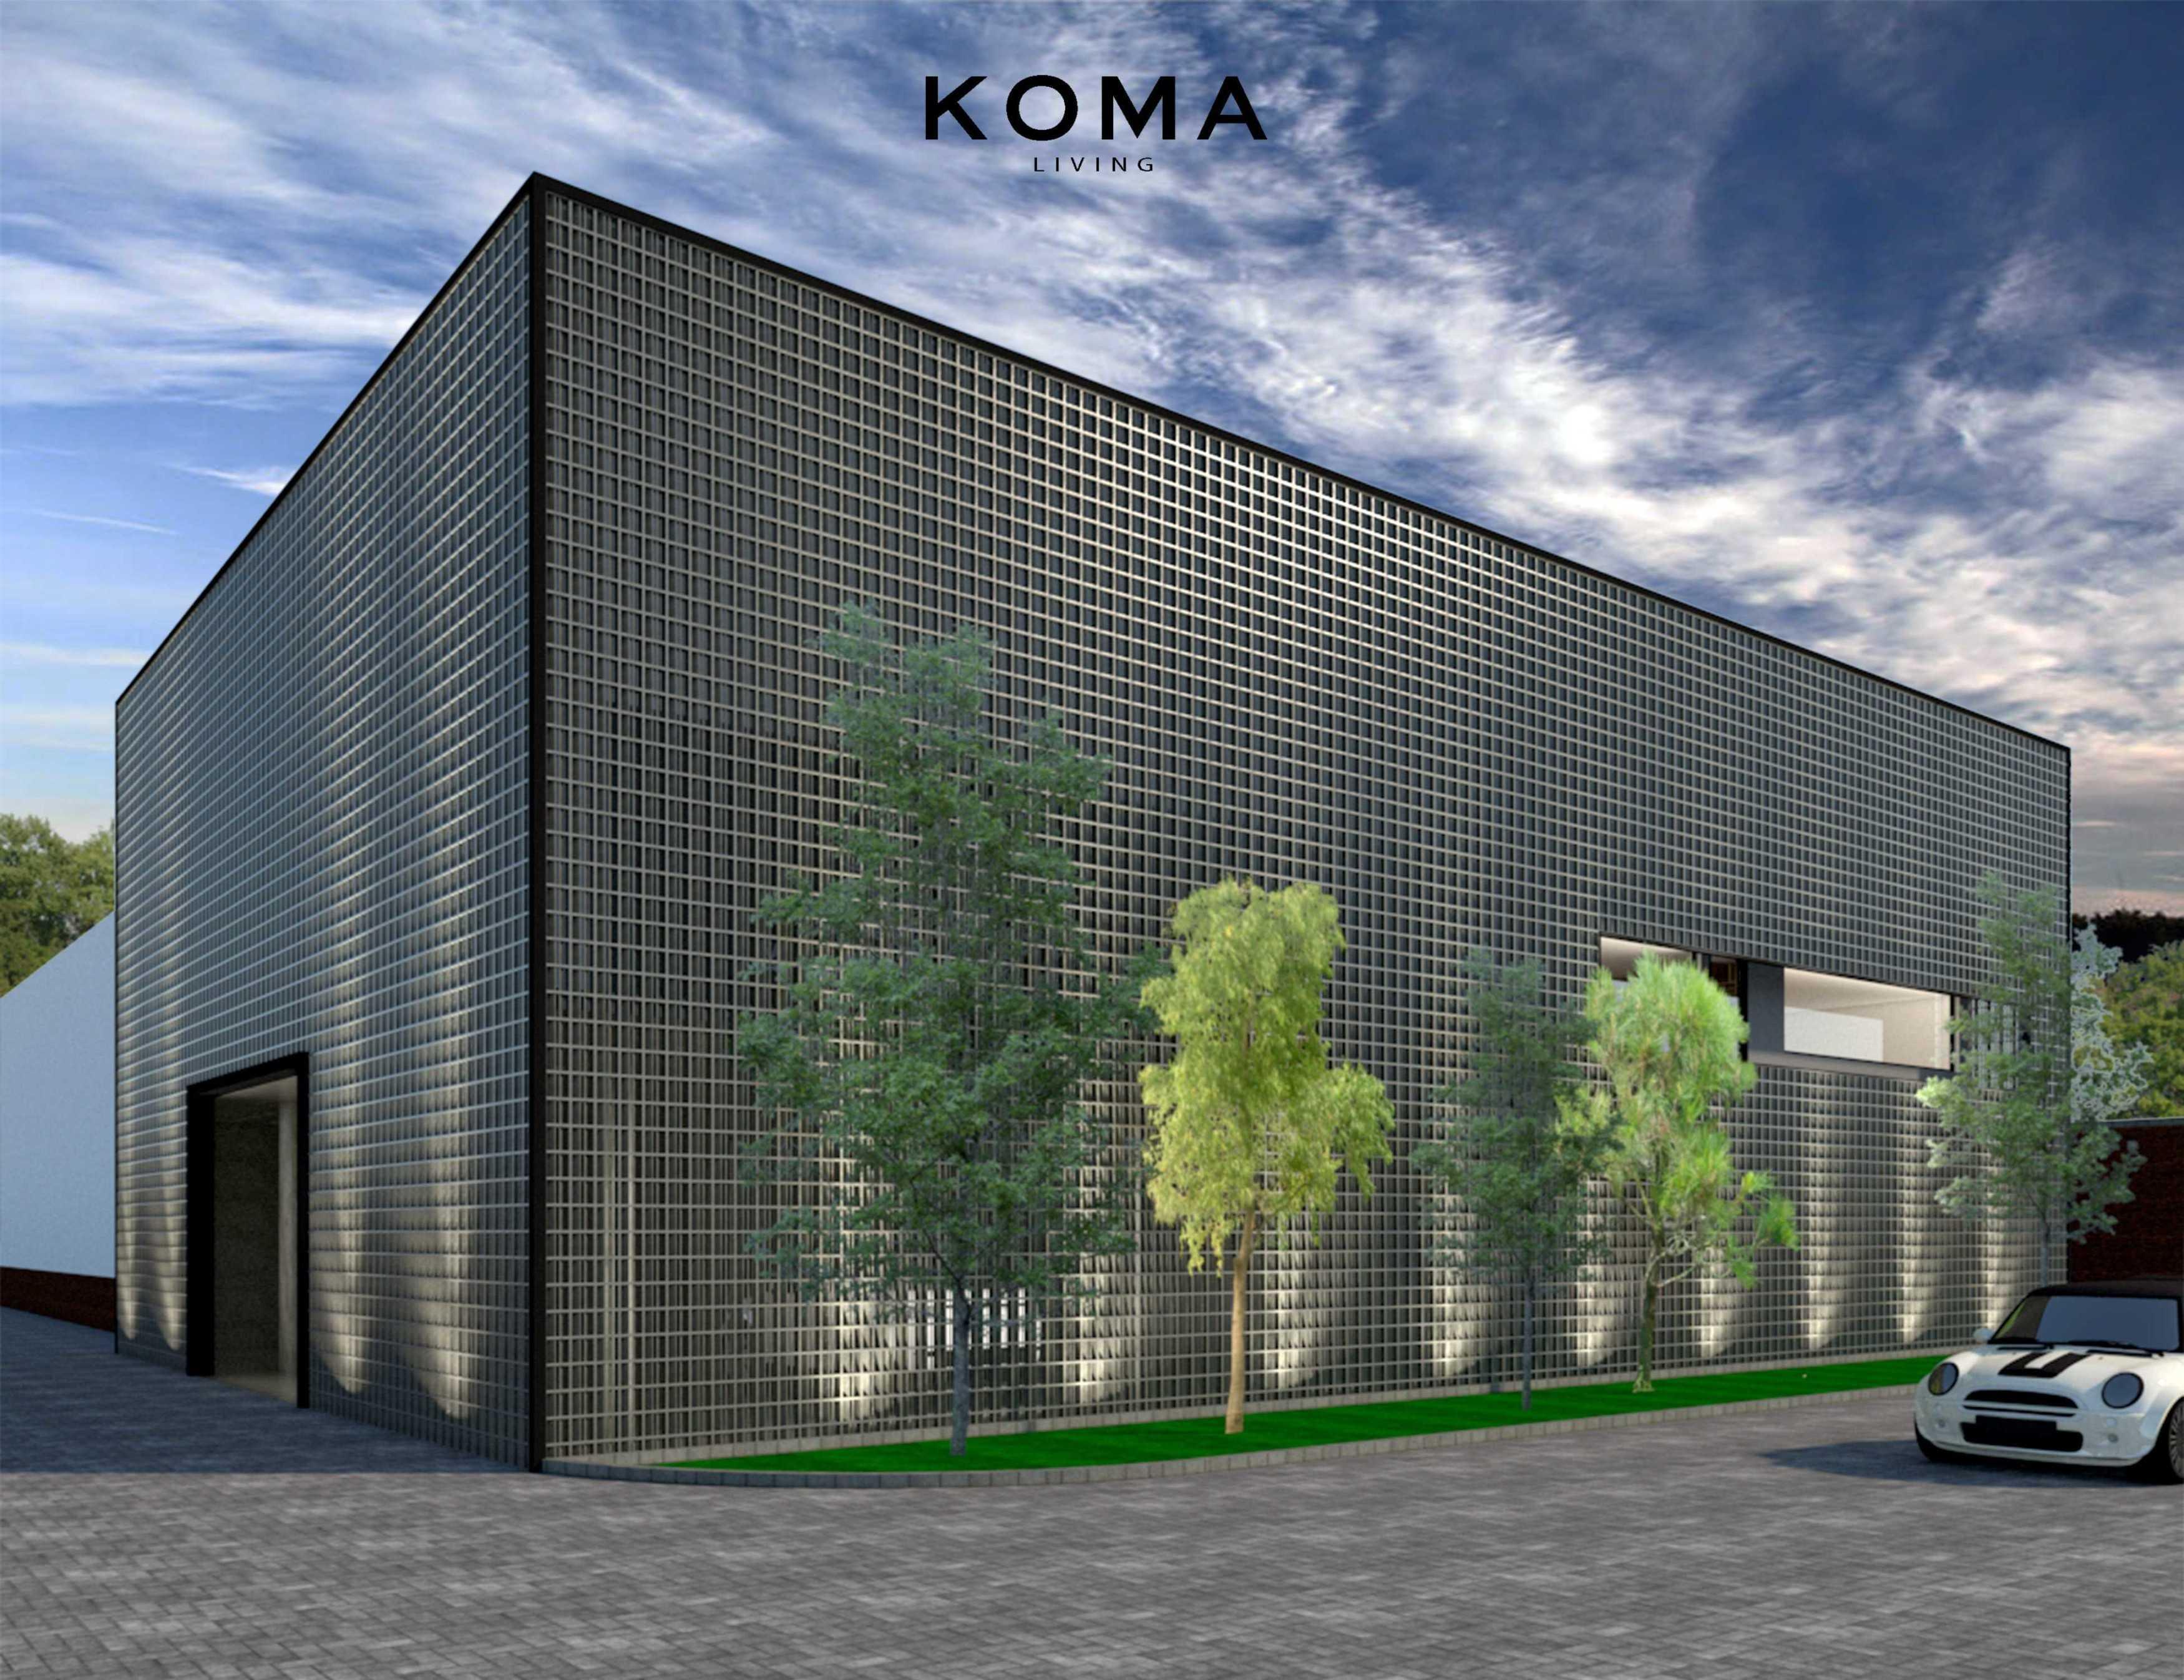 Koma Stt Office Papua, Indonesia Papua, Indonesia Koma-Stt-Office   70249